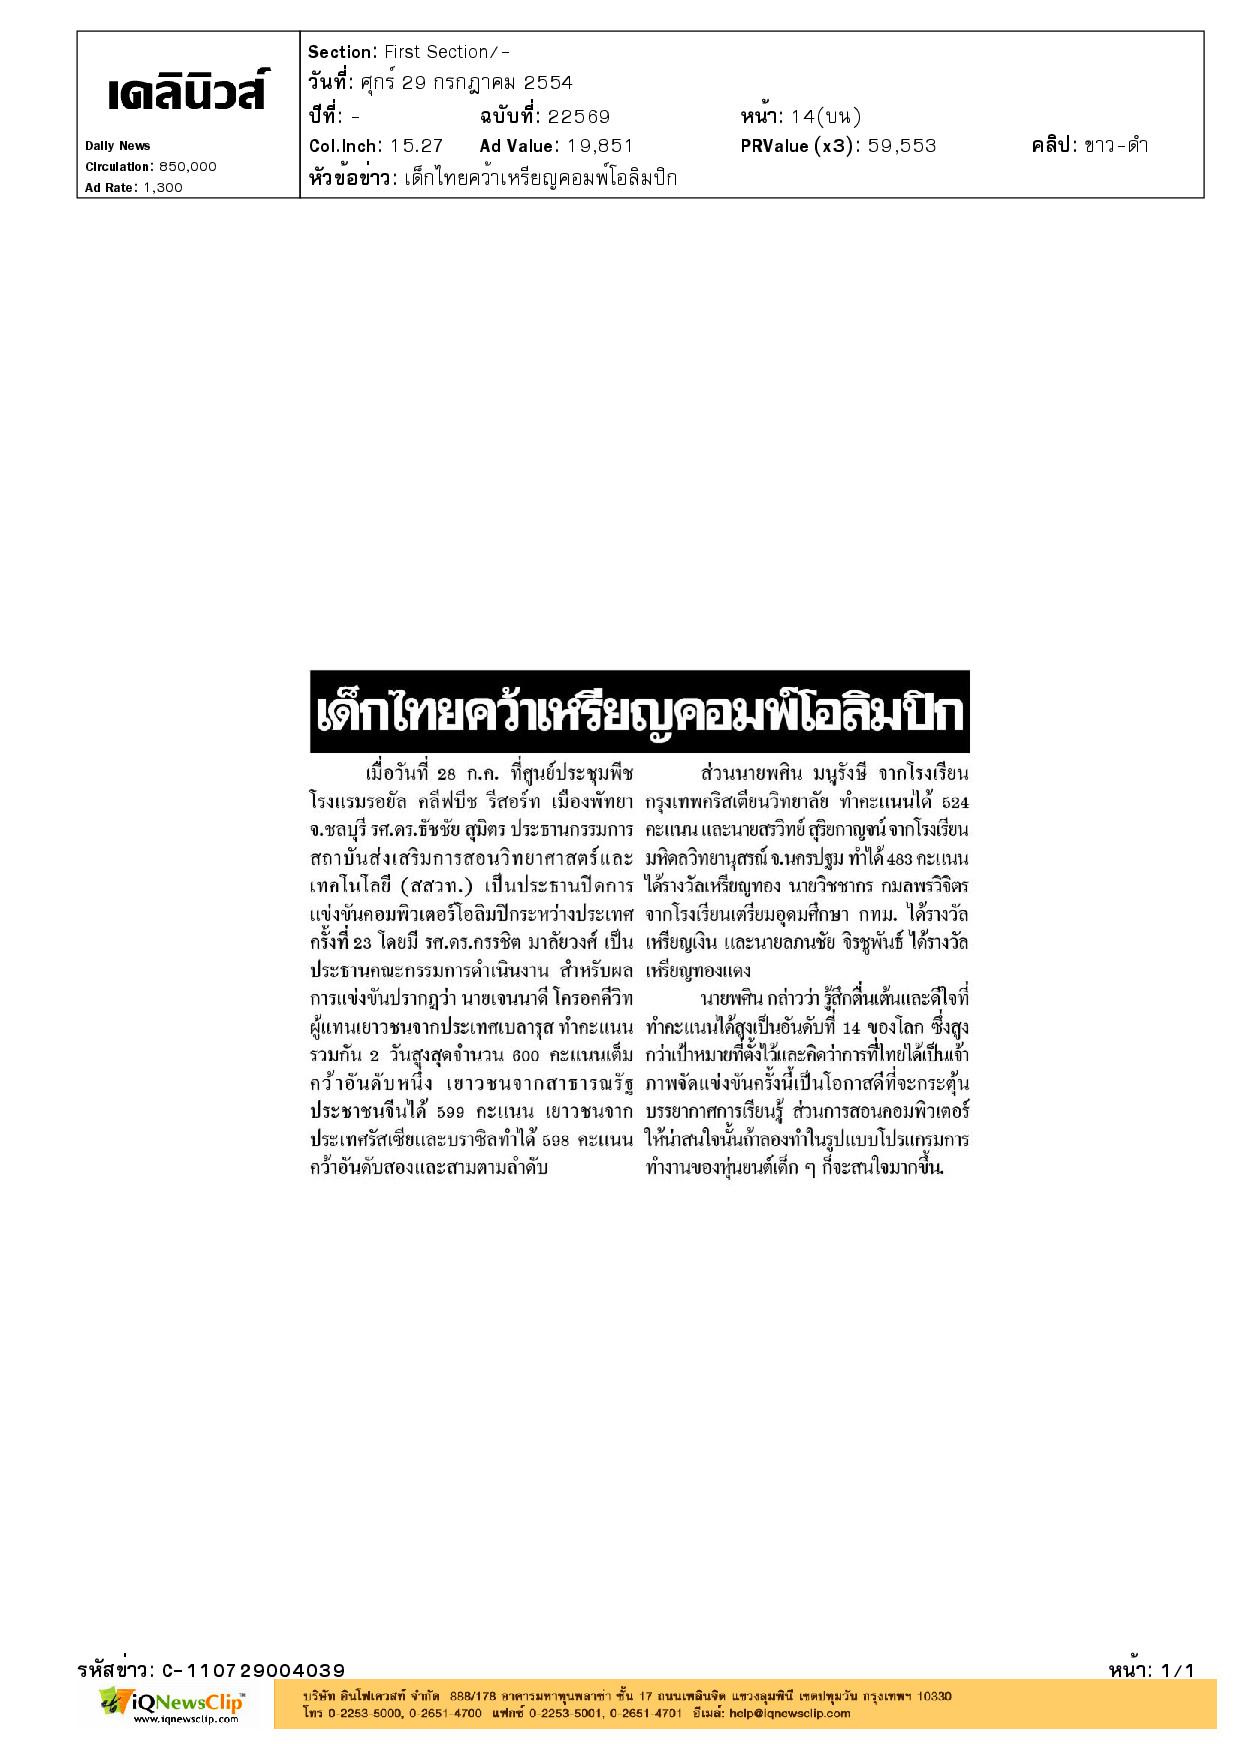 C-110729004039.pdf